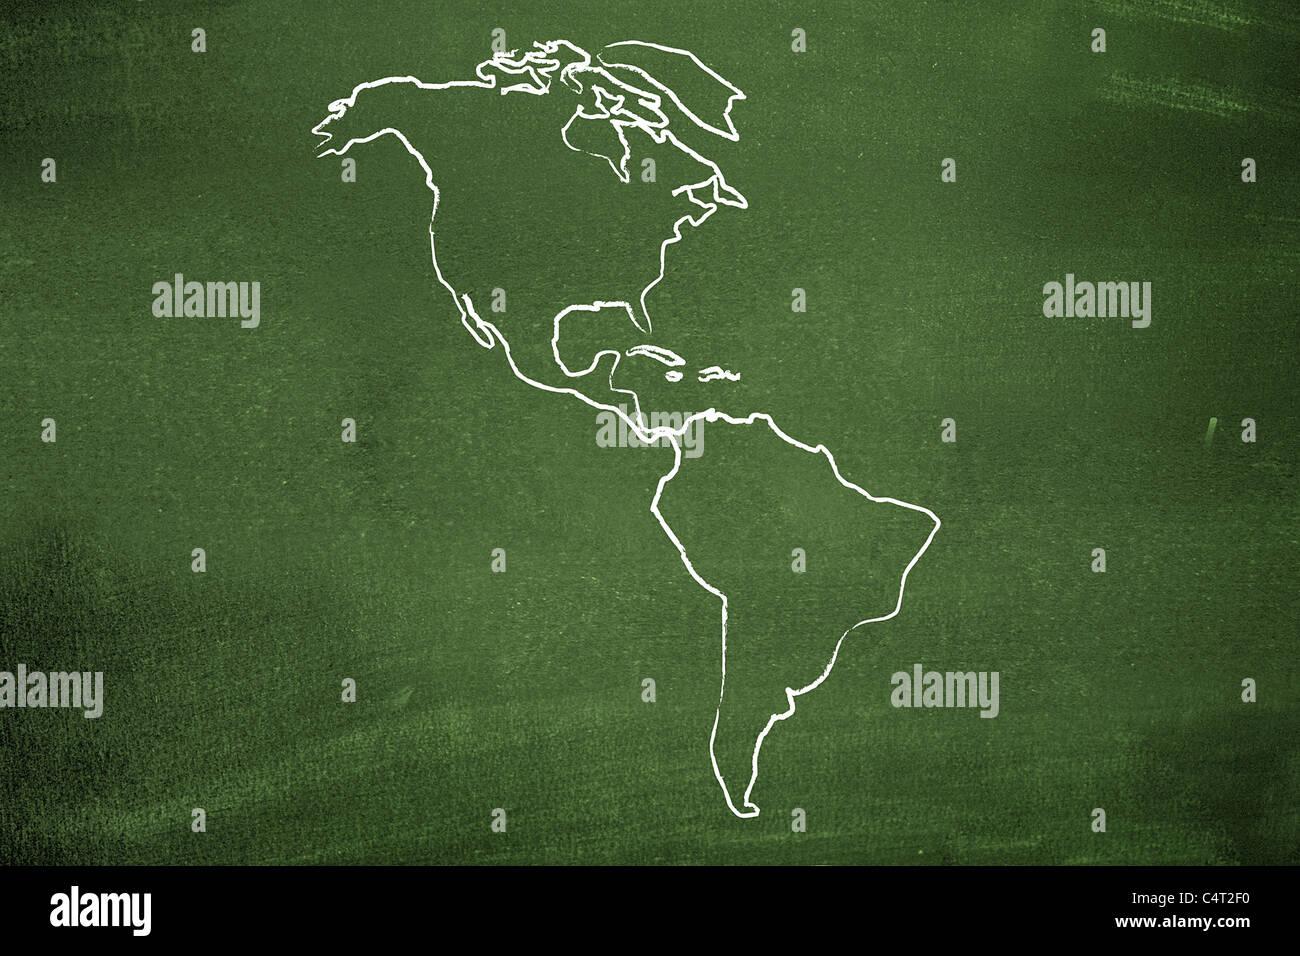 Las Américas Imagen De Stock